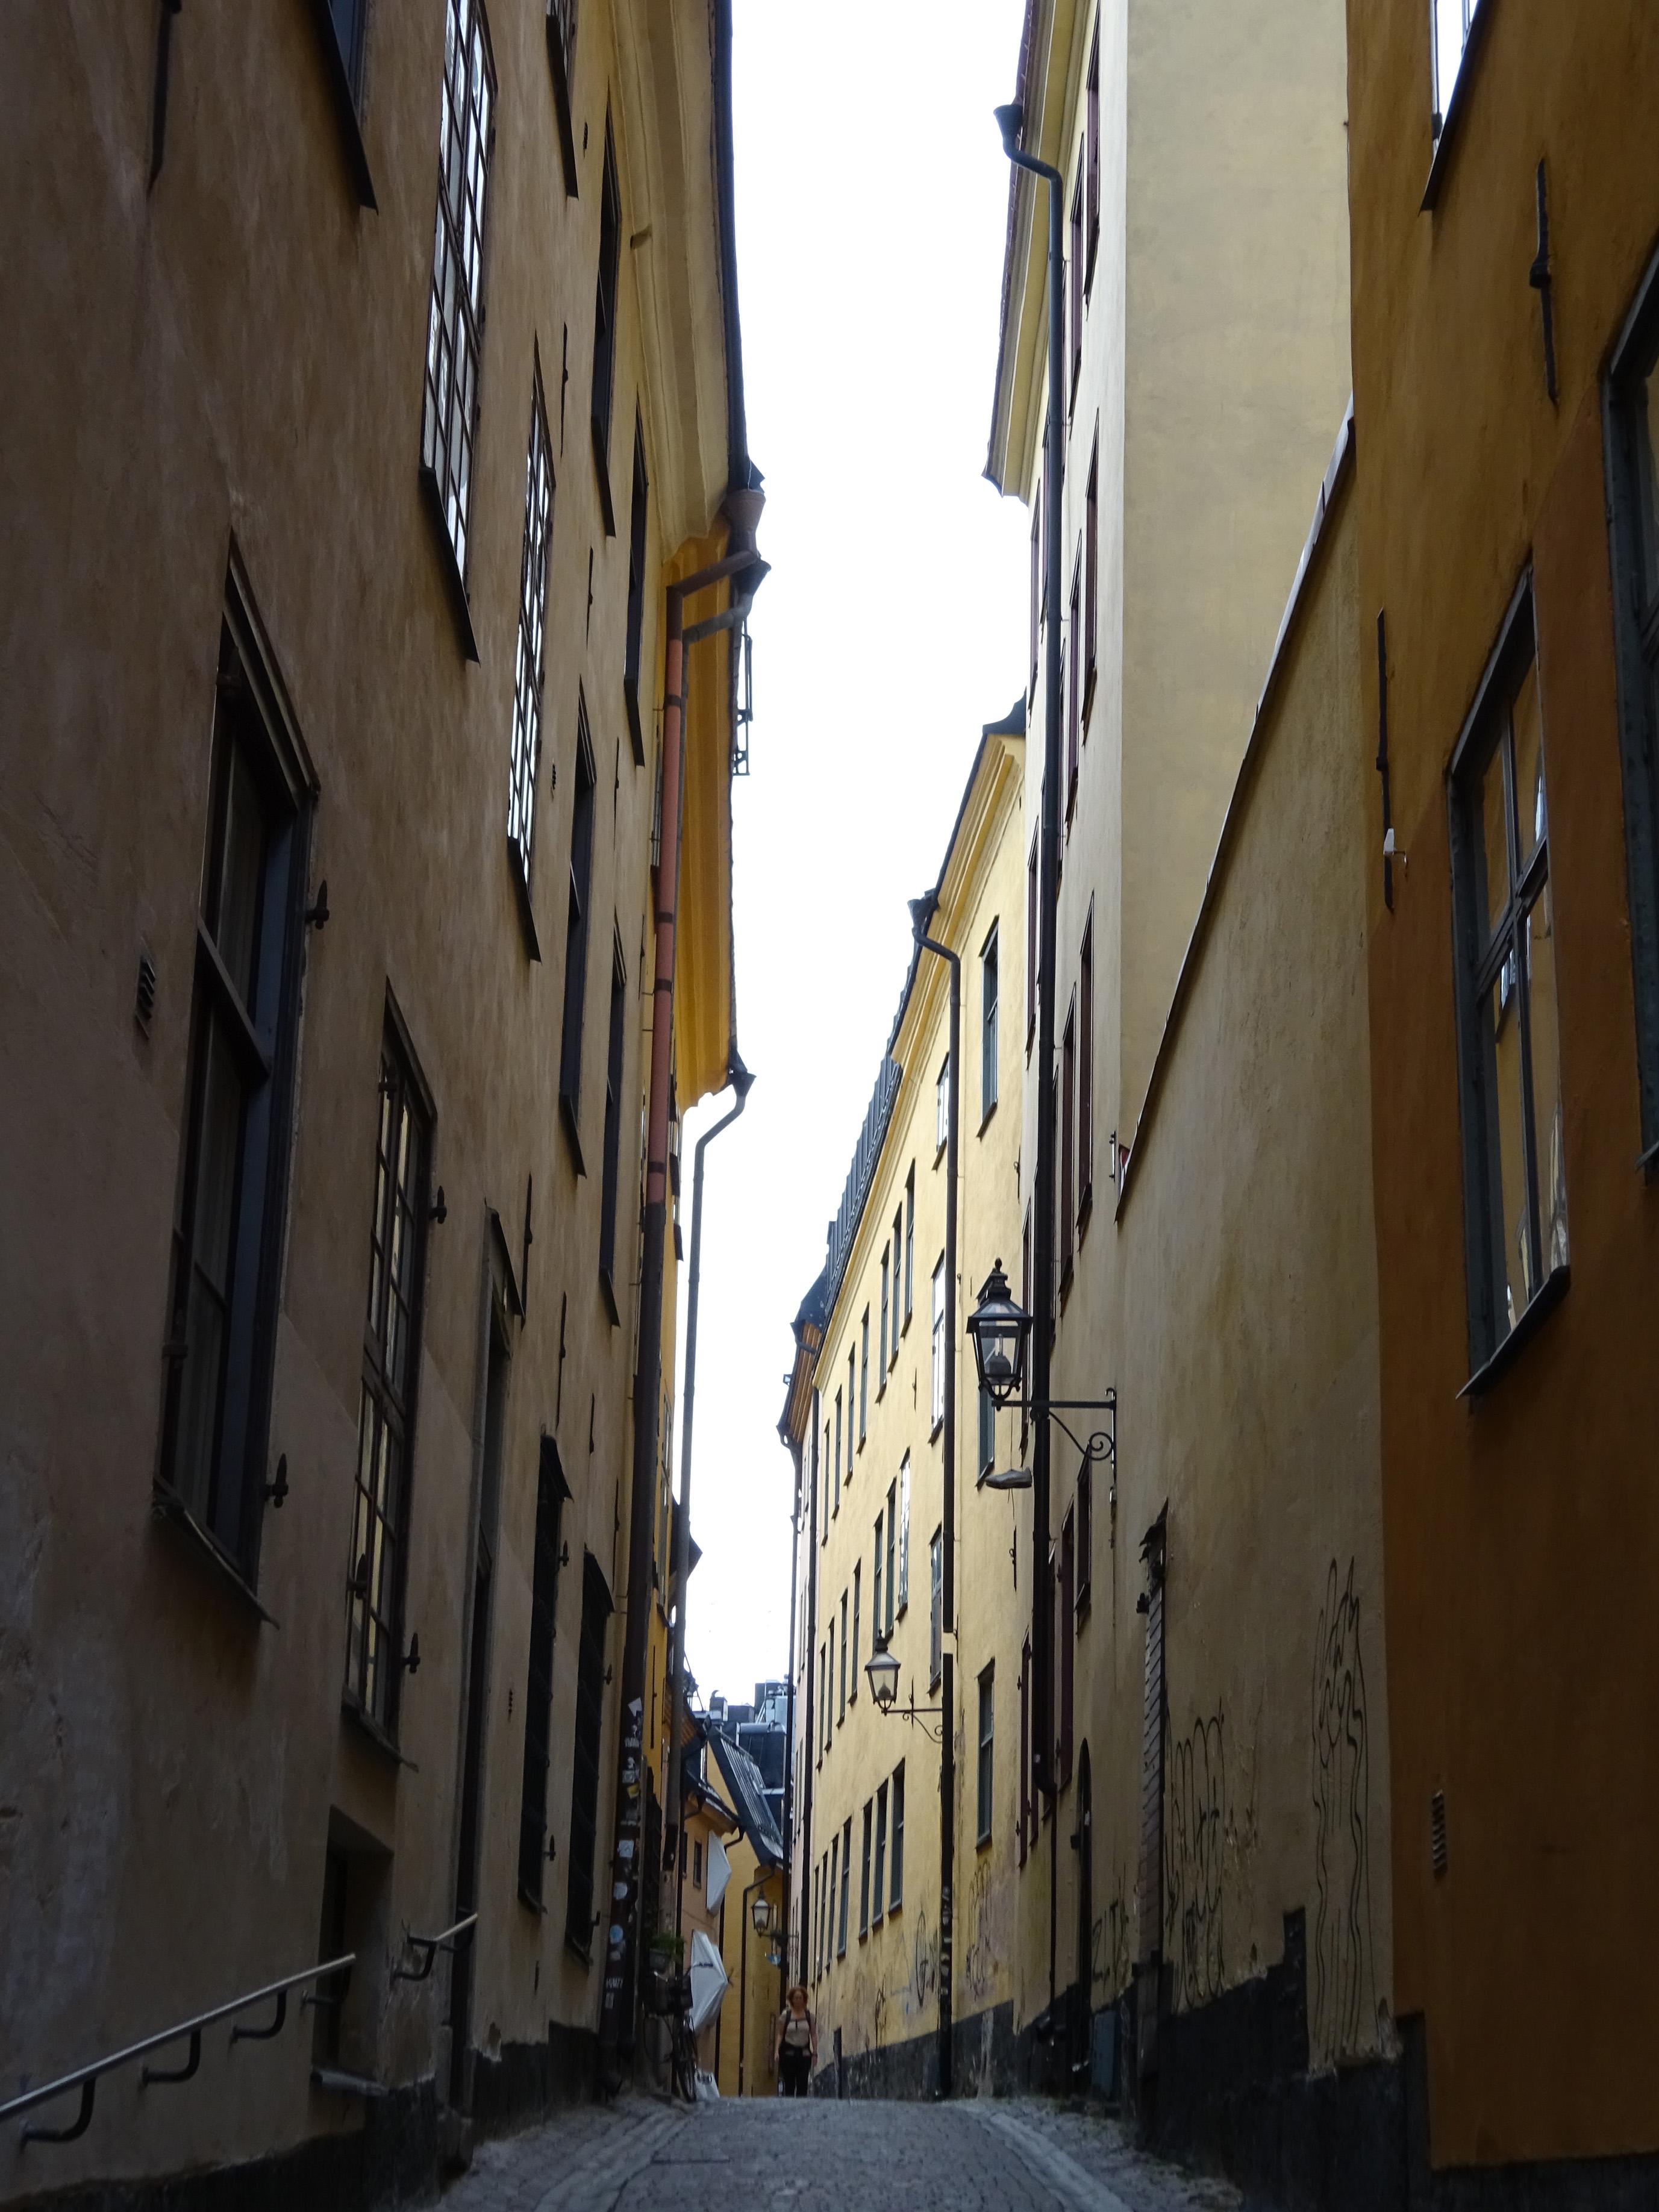 blog_d14s04_stockholm_006.jpg